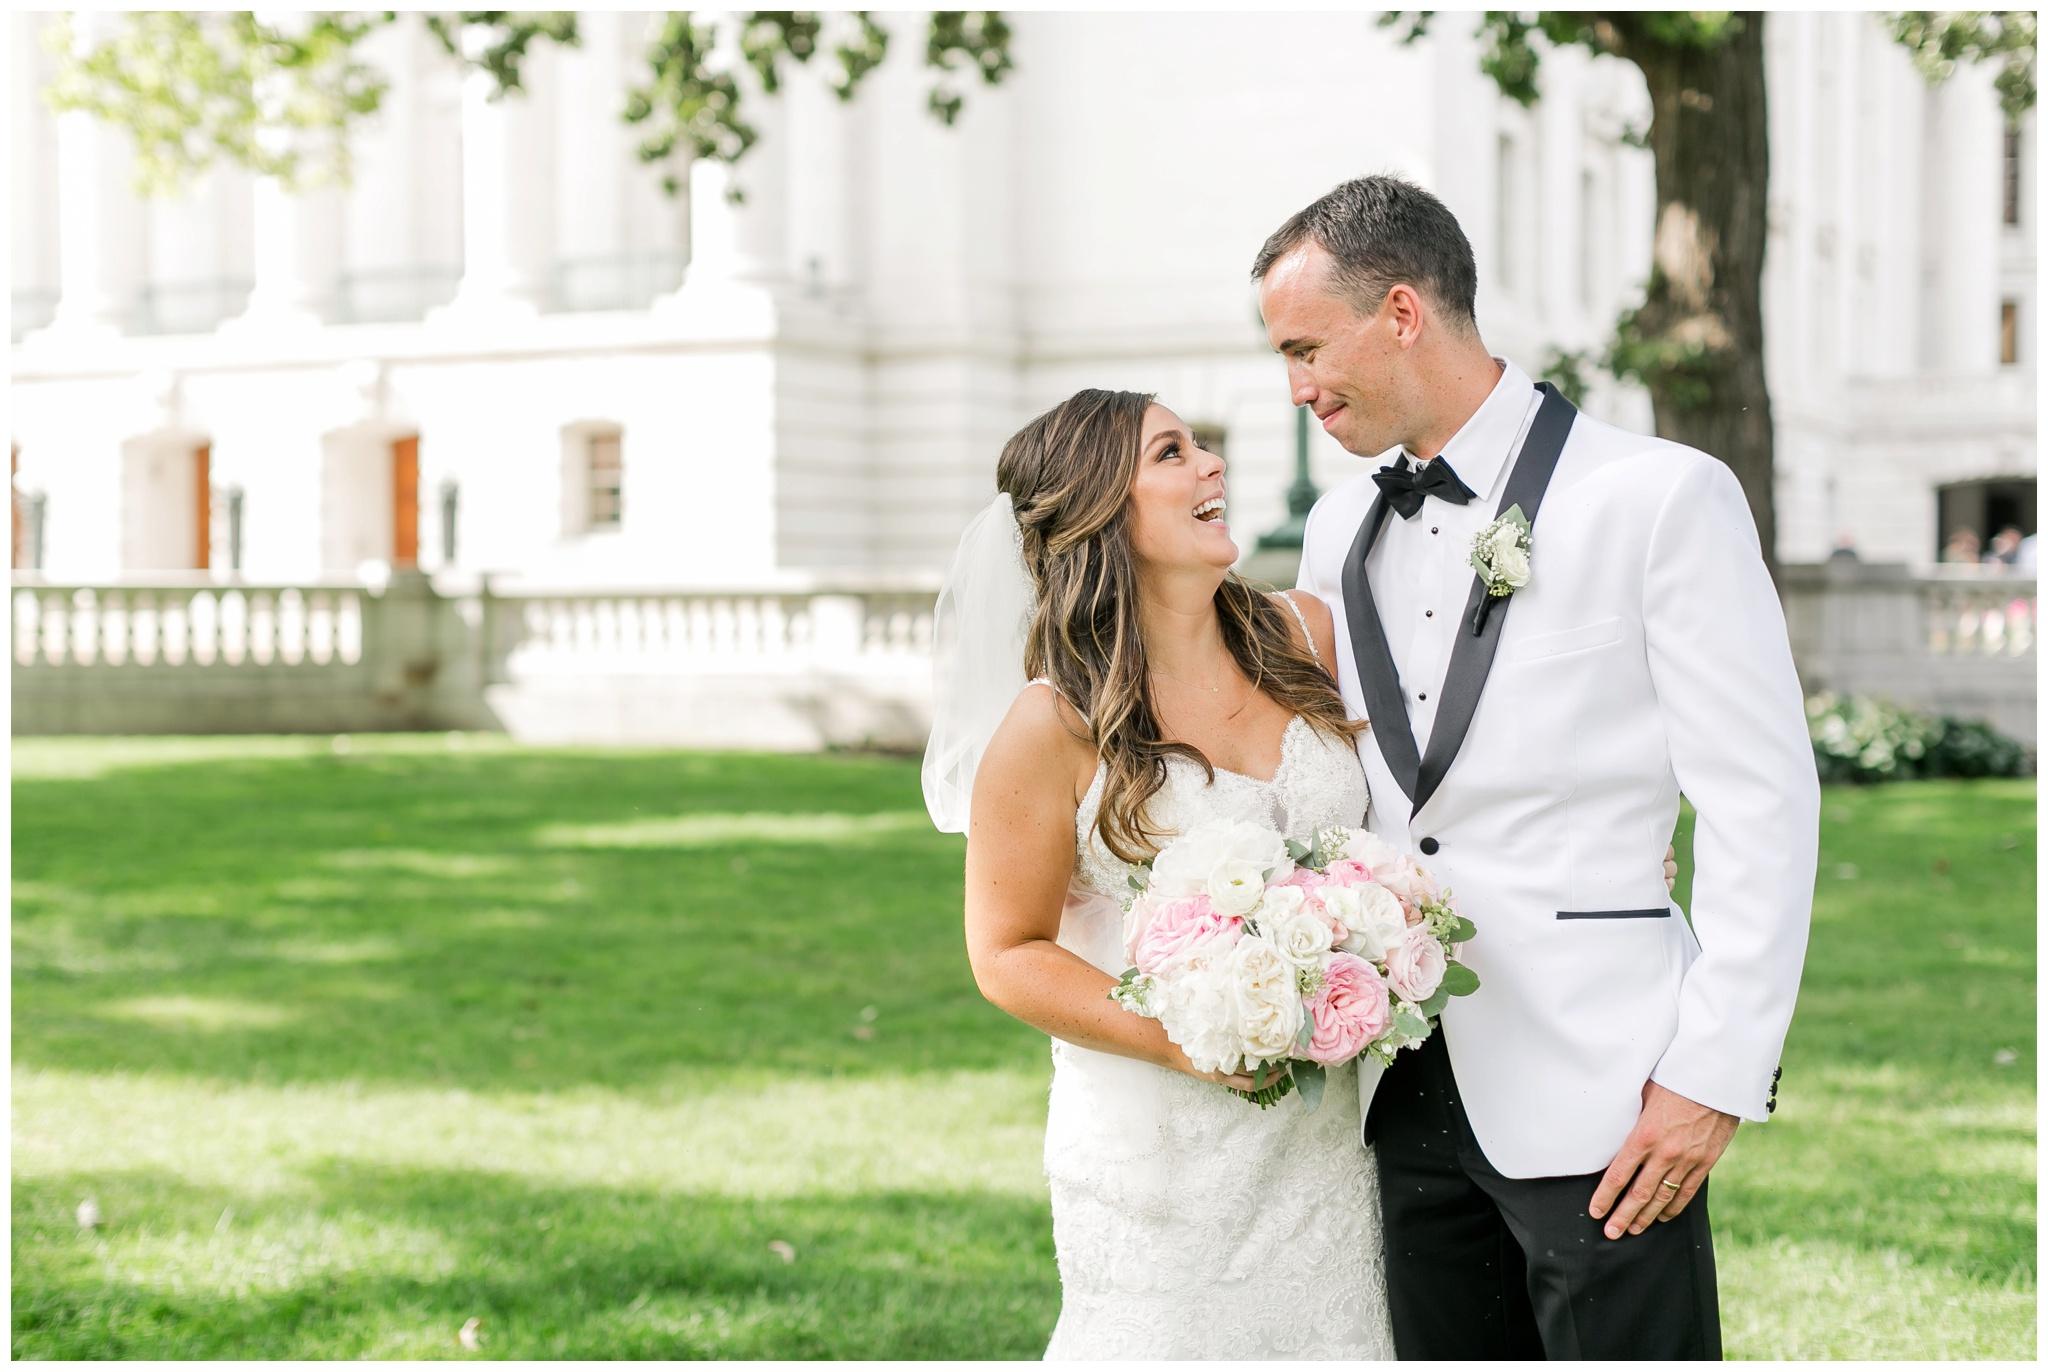 UW_Memorial_Union_wedding_madison_wisconsin_wedding_photographers_4623.jpg